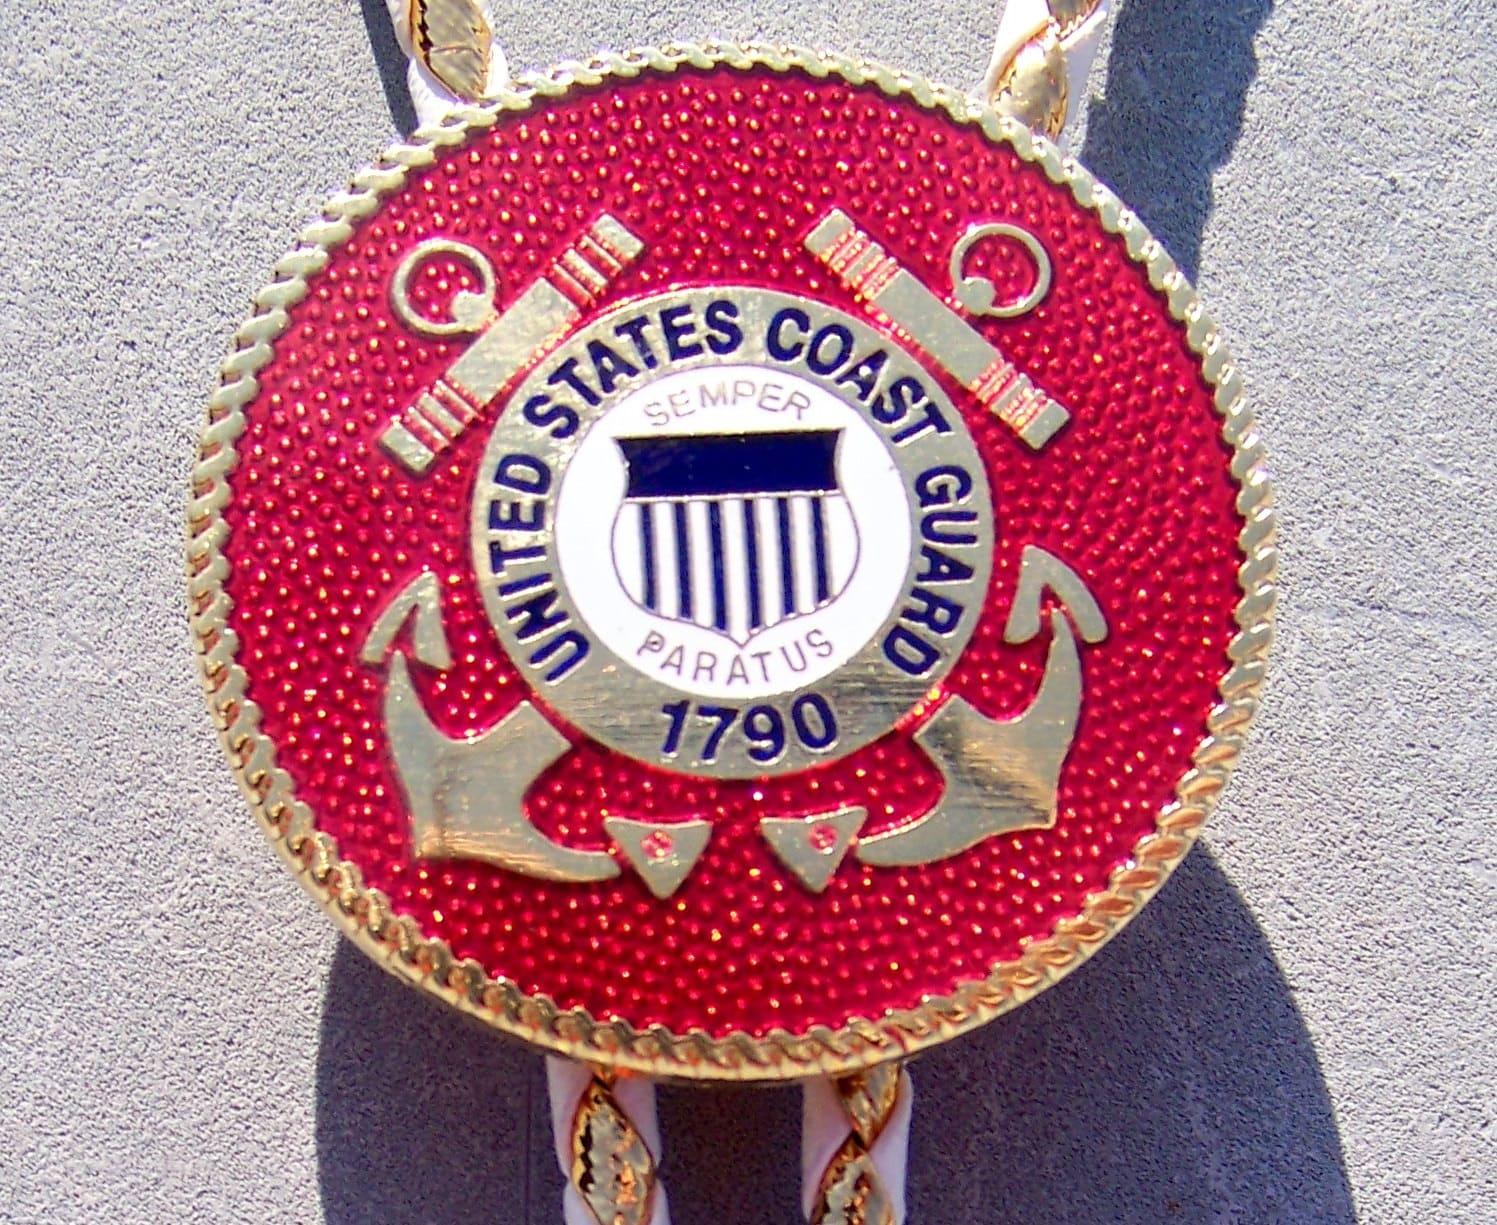 U.S. Coast Guard Color Emblem Bolo Tie Dressy White And Gold